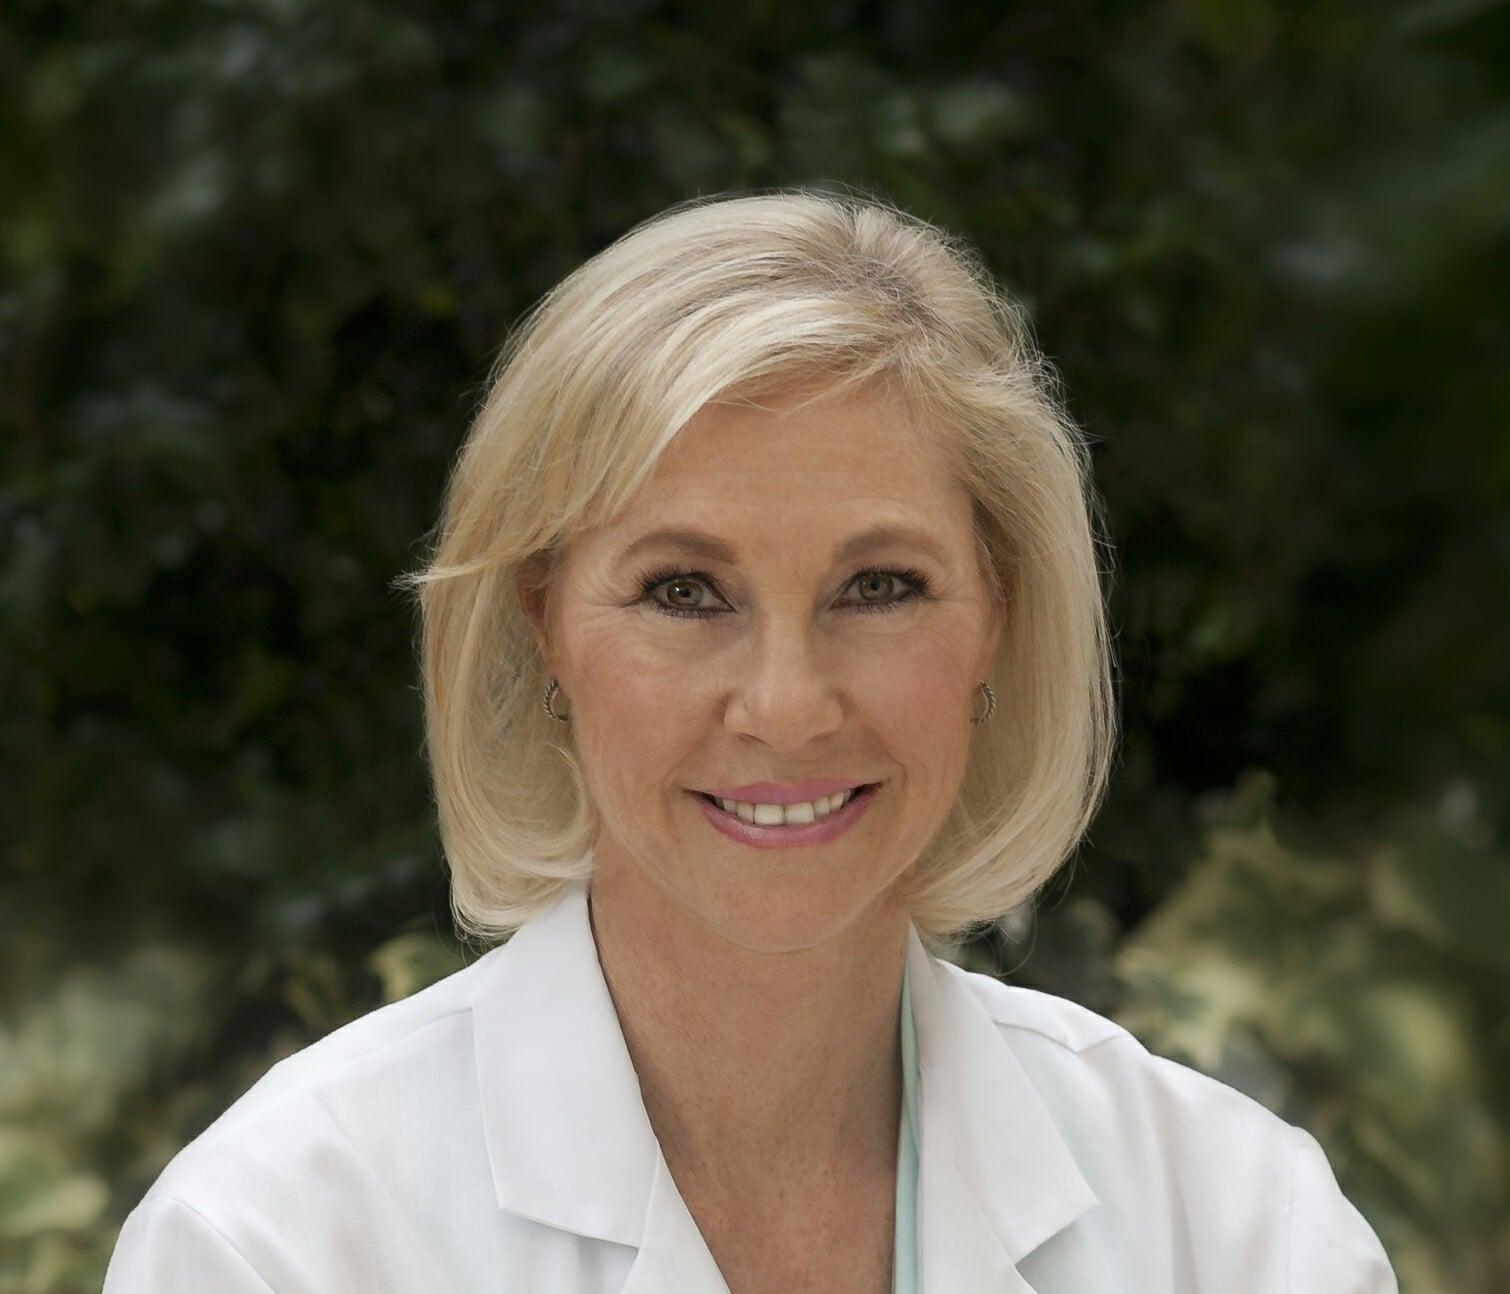 Dr. Tina B Koopersmith MD